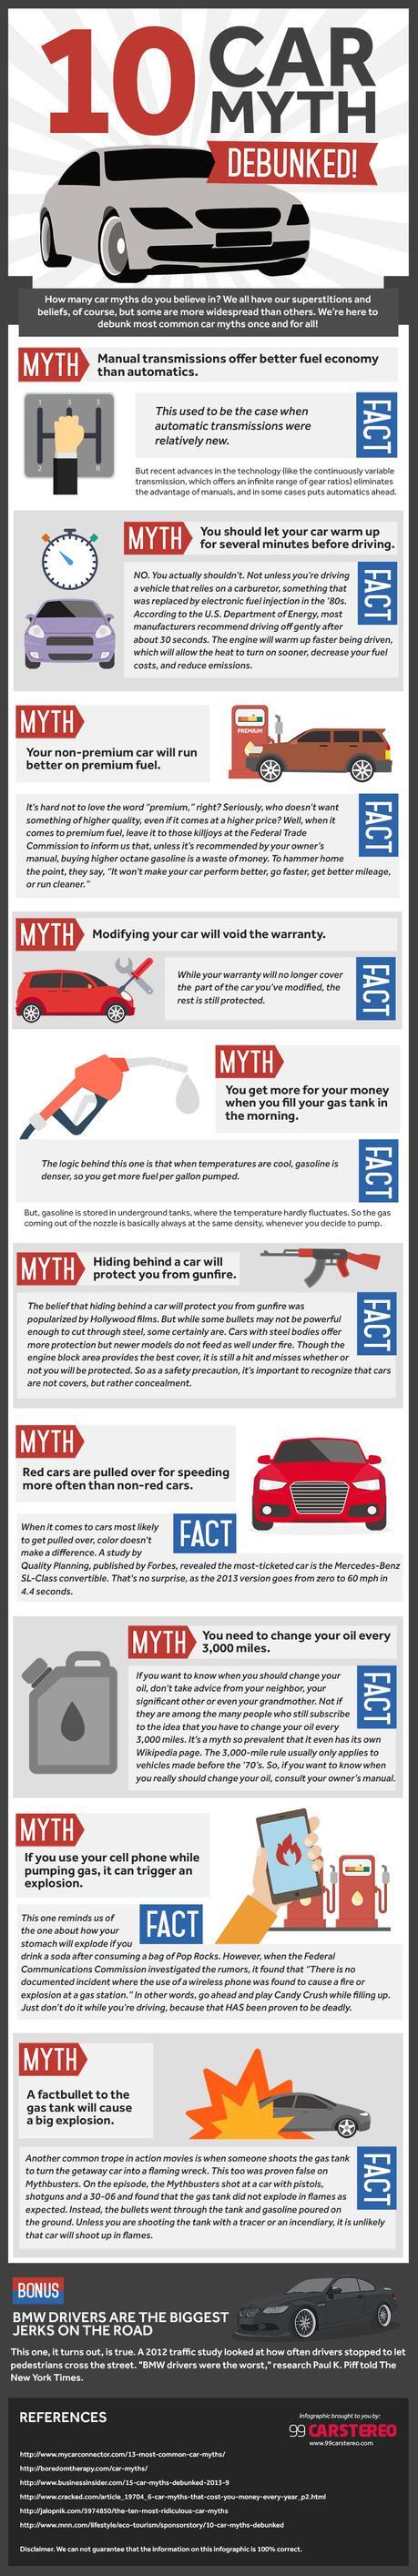 Top 10 Automobile Myths